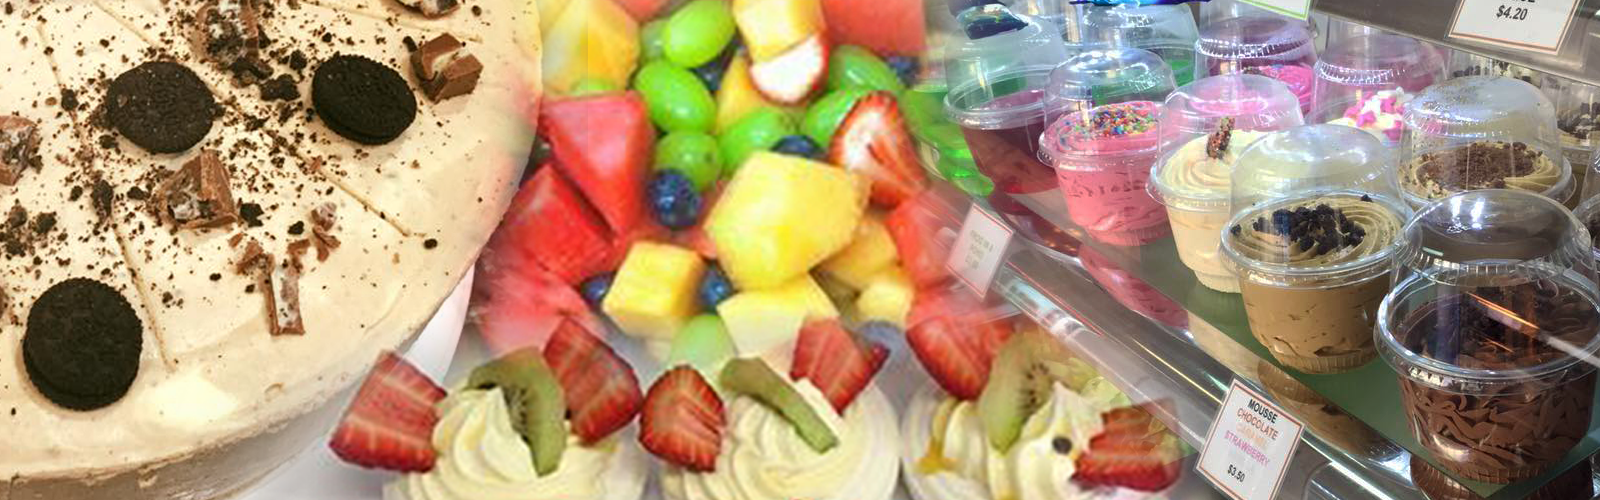 carvn-dessert-header-pic